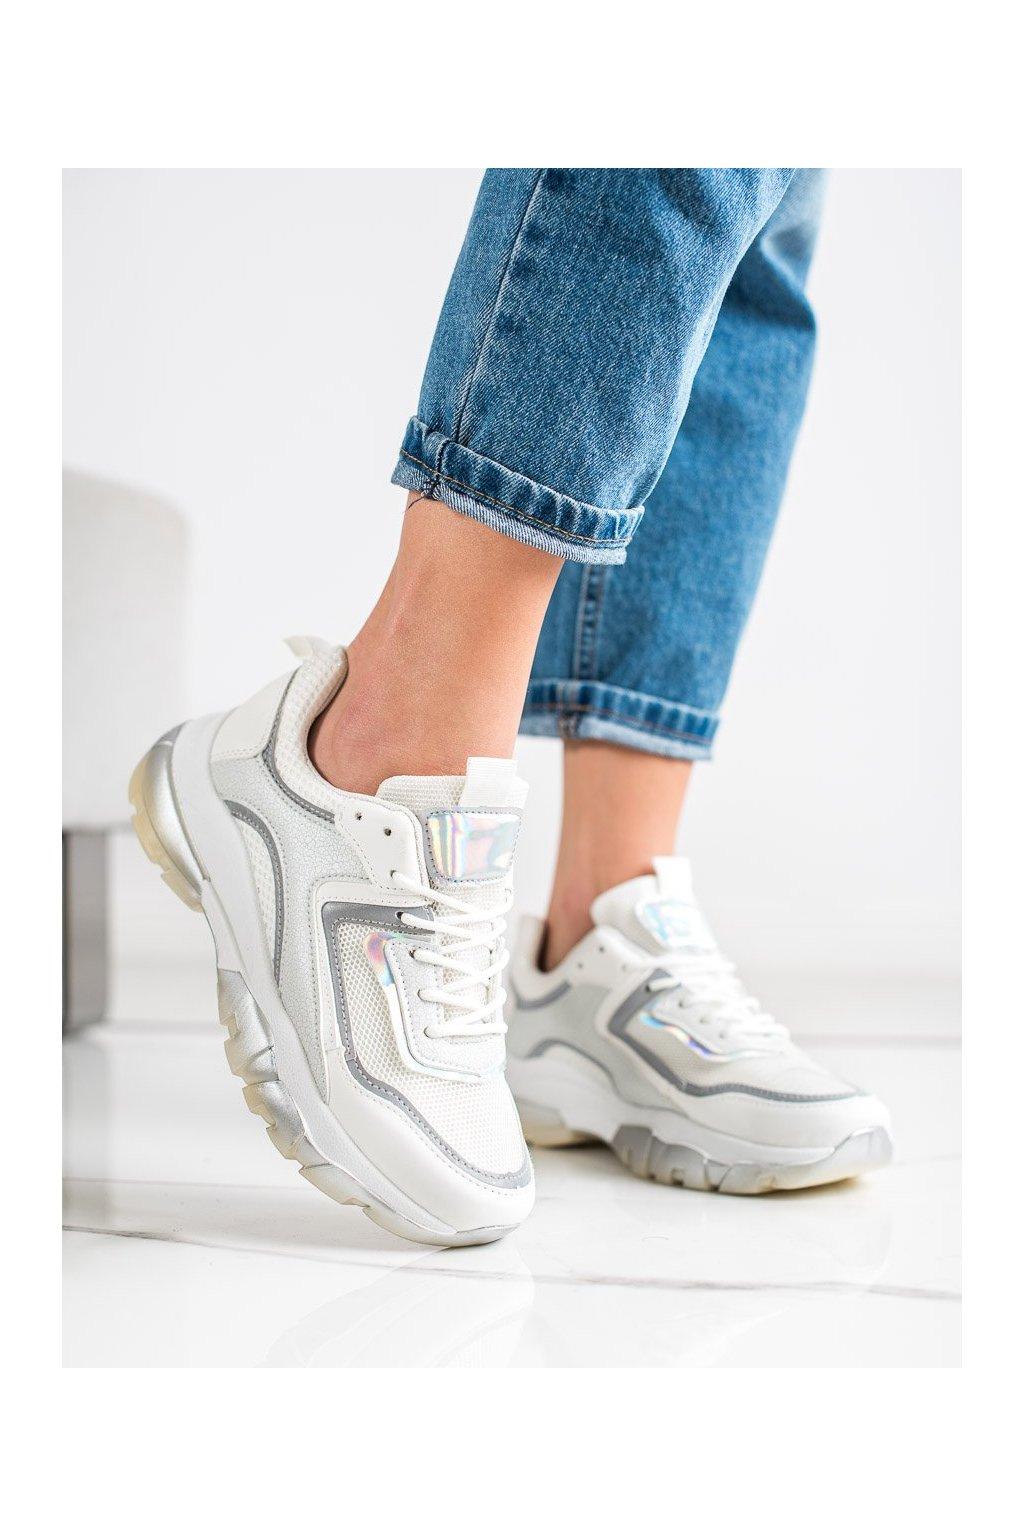 Biele tenisky Ideal shoes kod 9796W